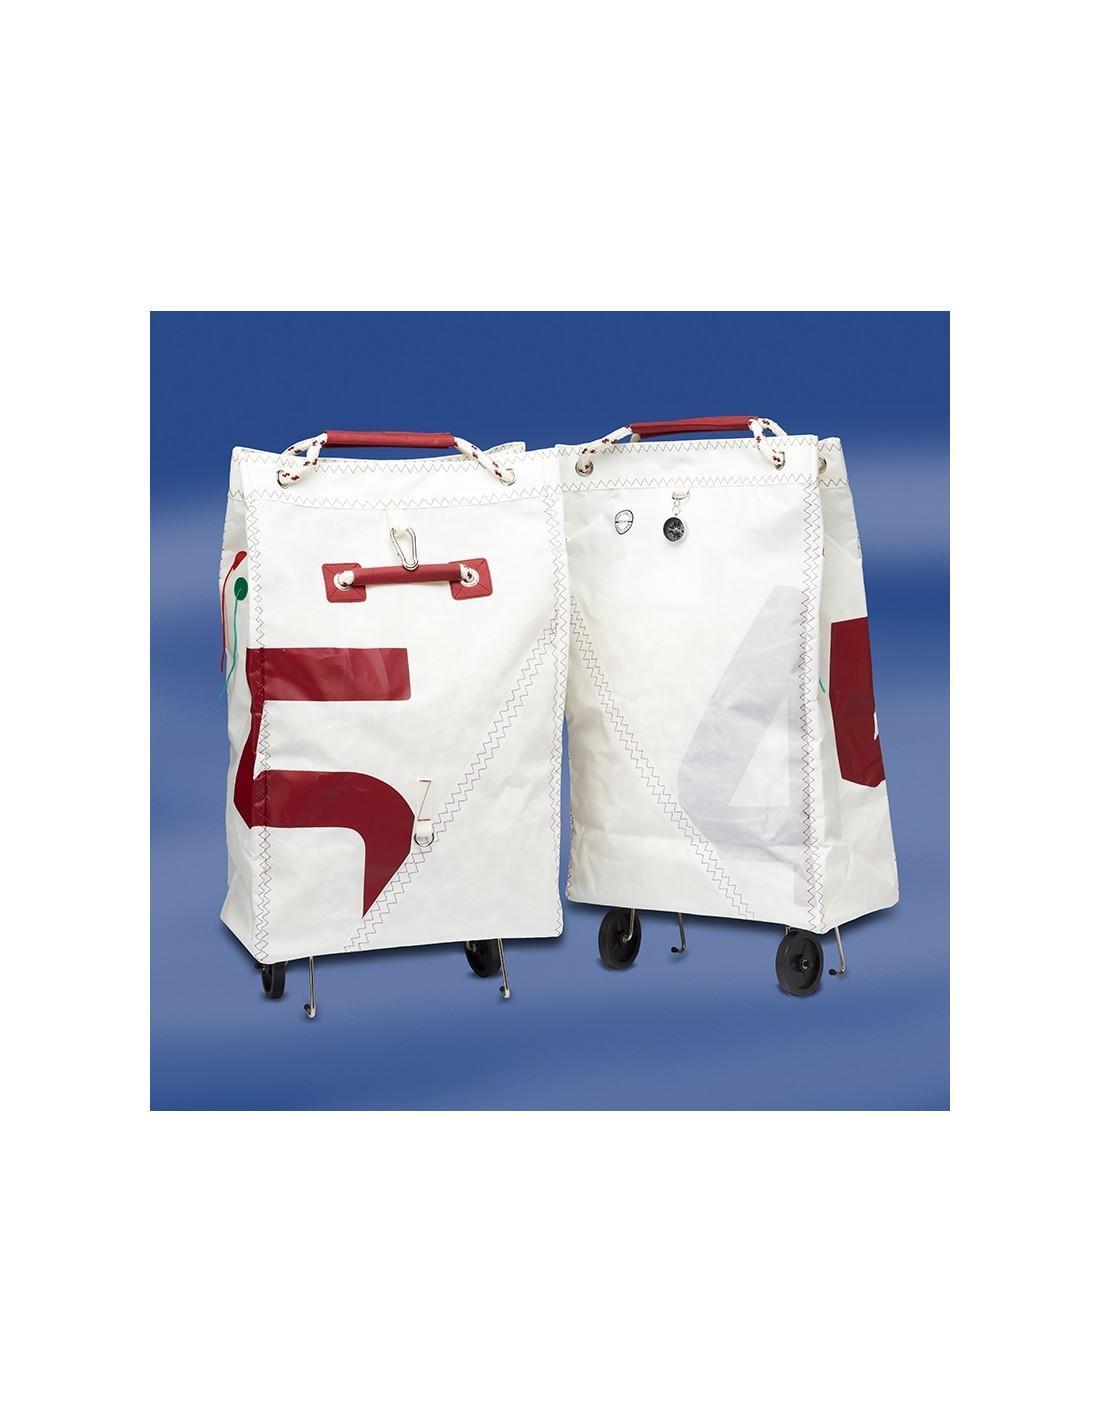 Opvouwbare Zeildoek Shopping Trolley - Sea King - Rood - Trend Marine - Zeildoek Tassen - TM1001.3